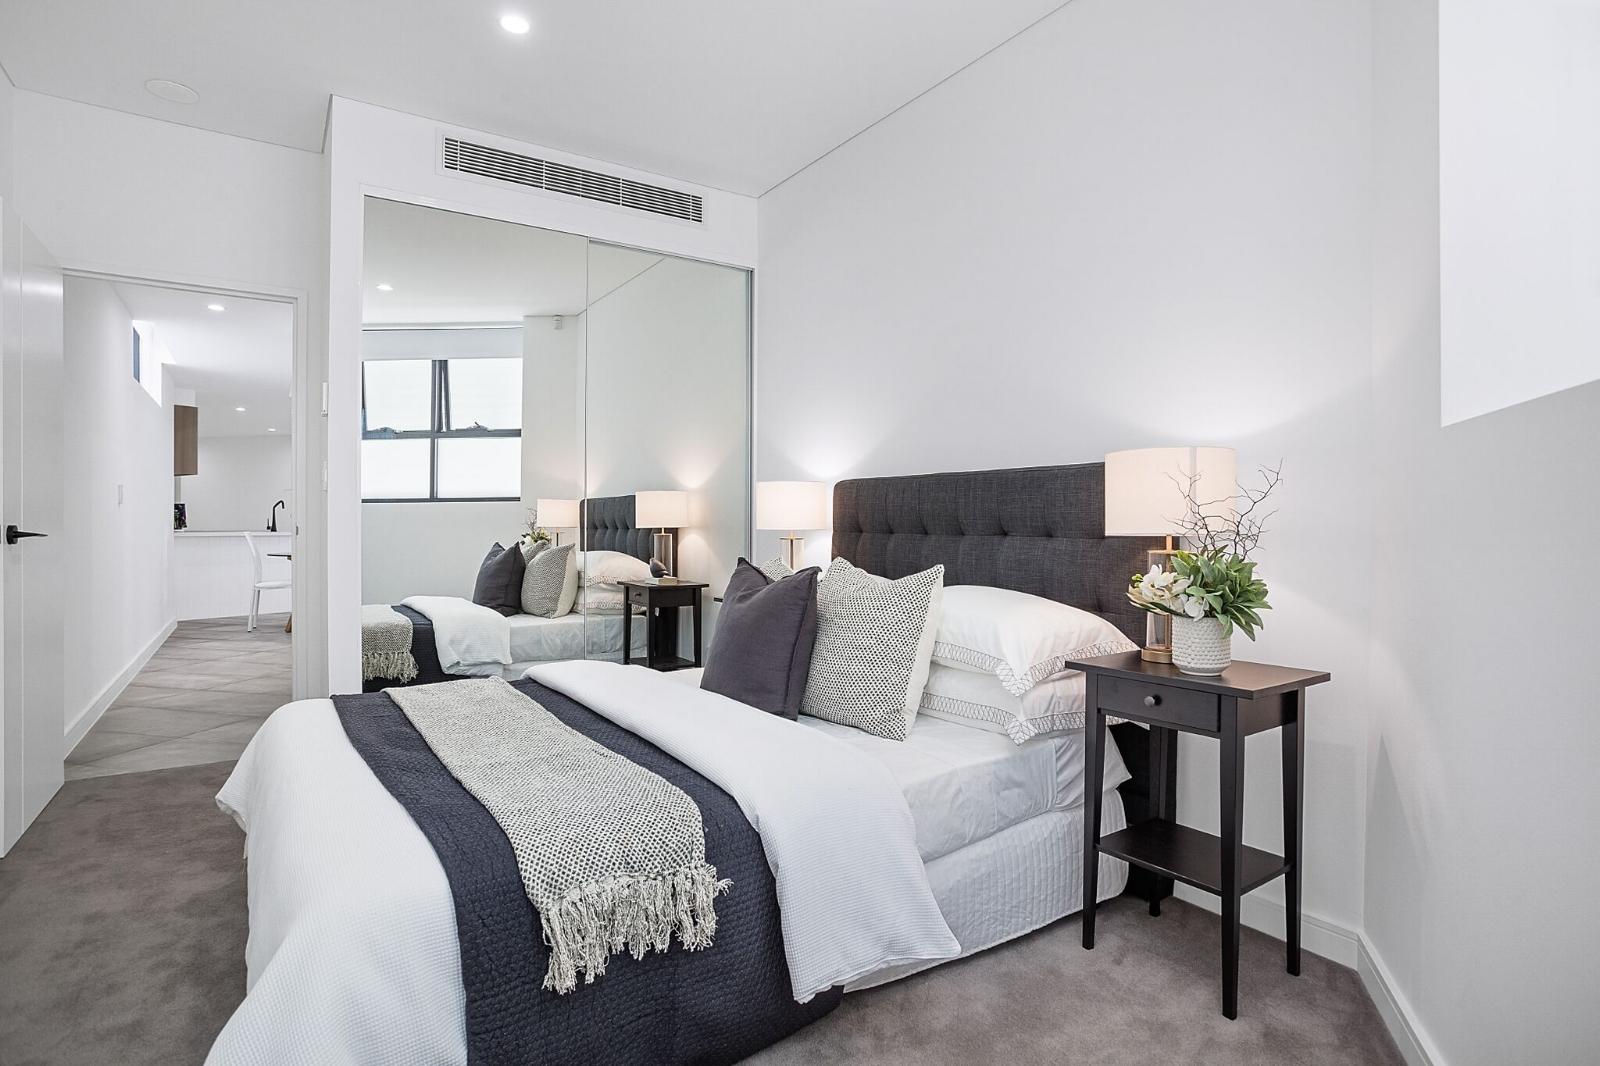 frazer_street_collaroy_bedroom_luxe_styling.jpeg